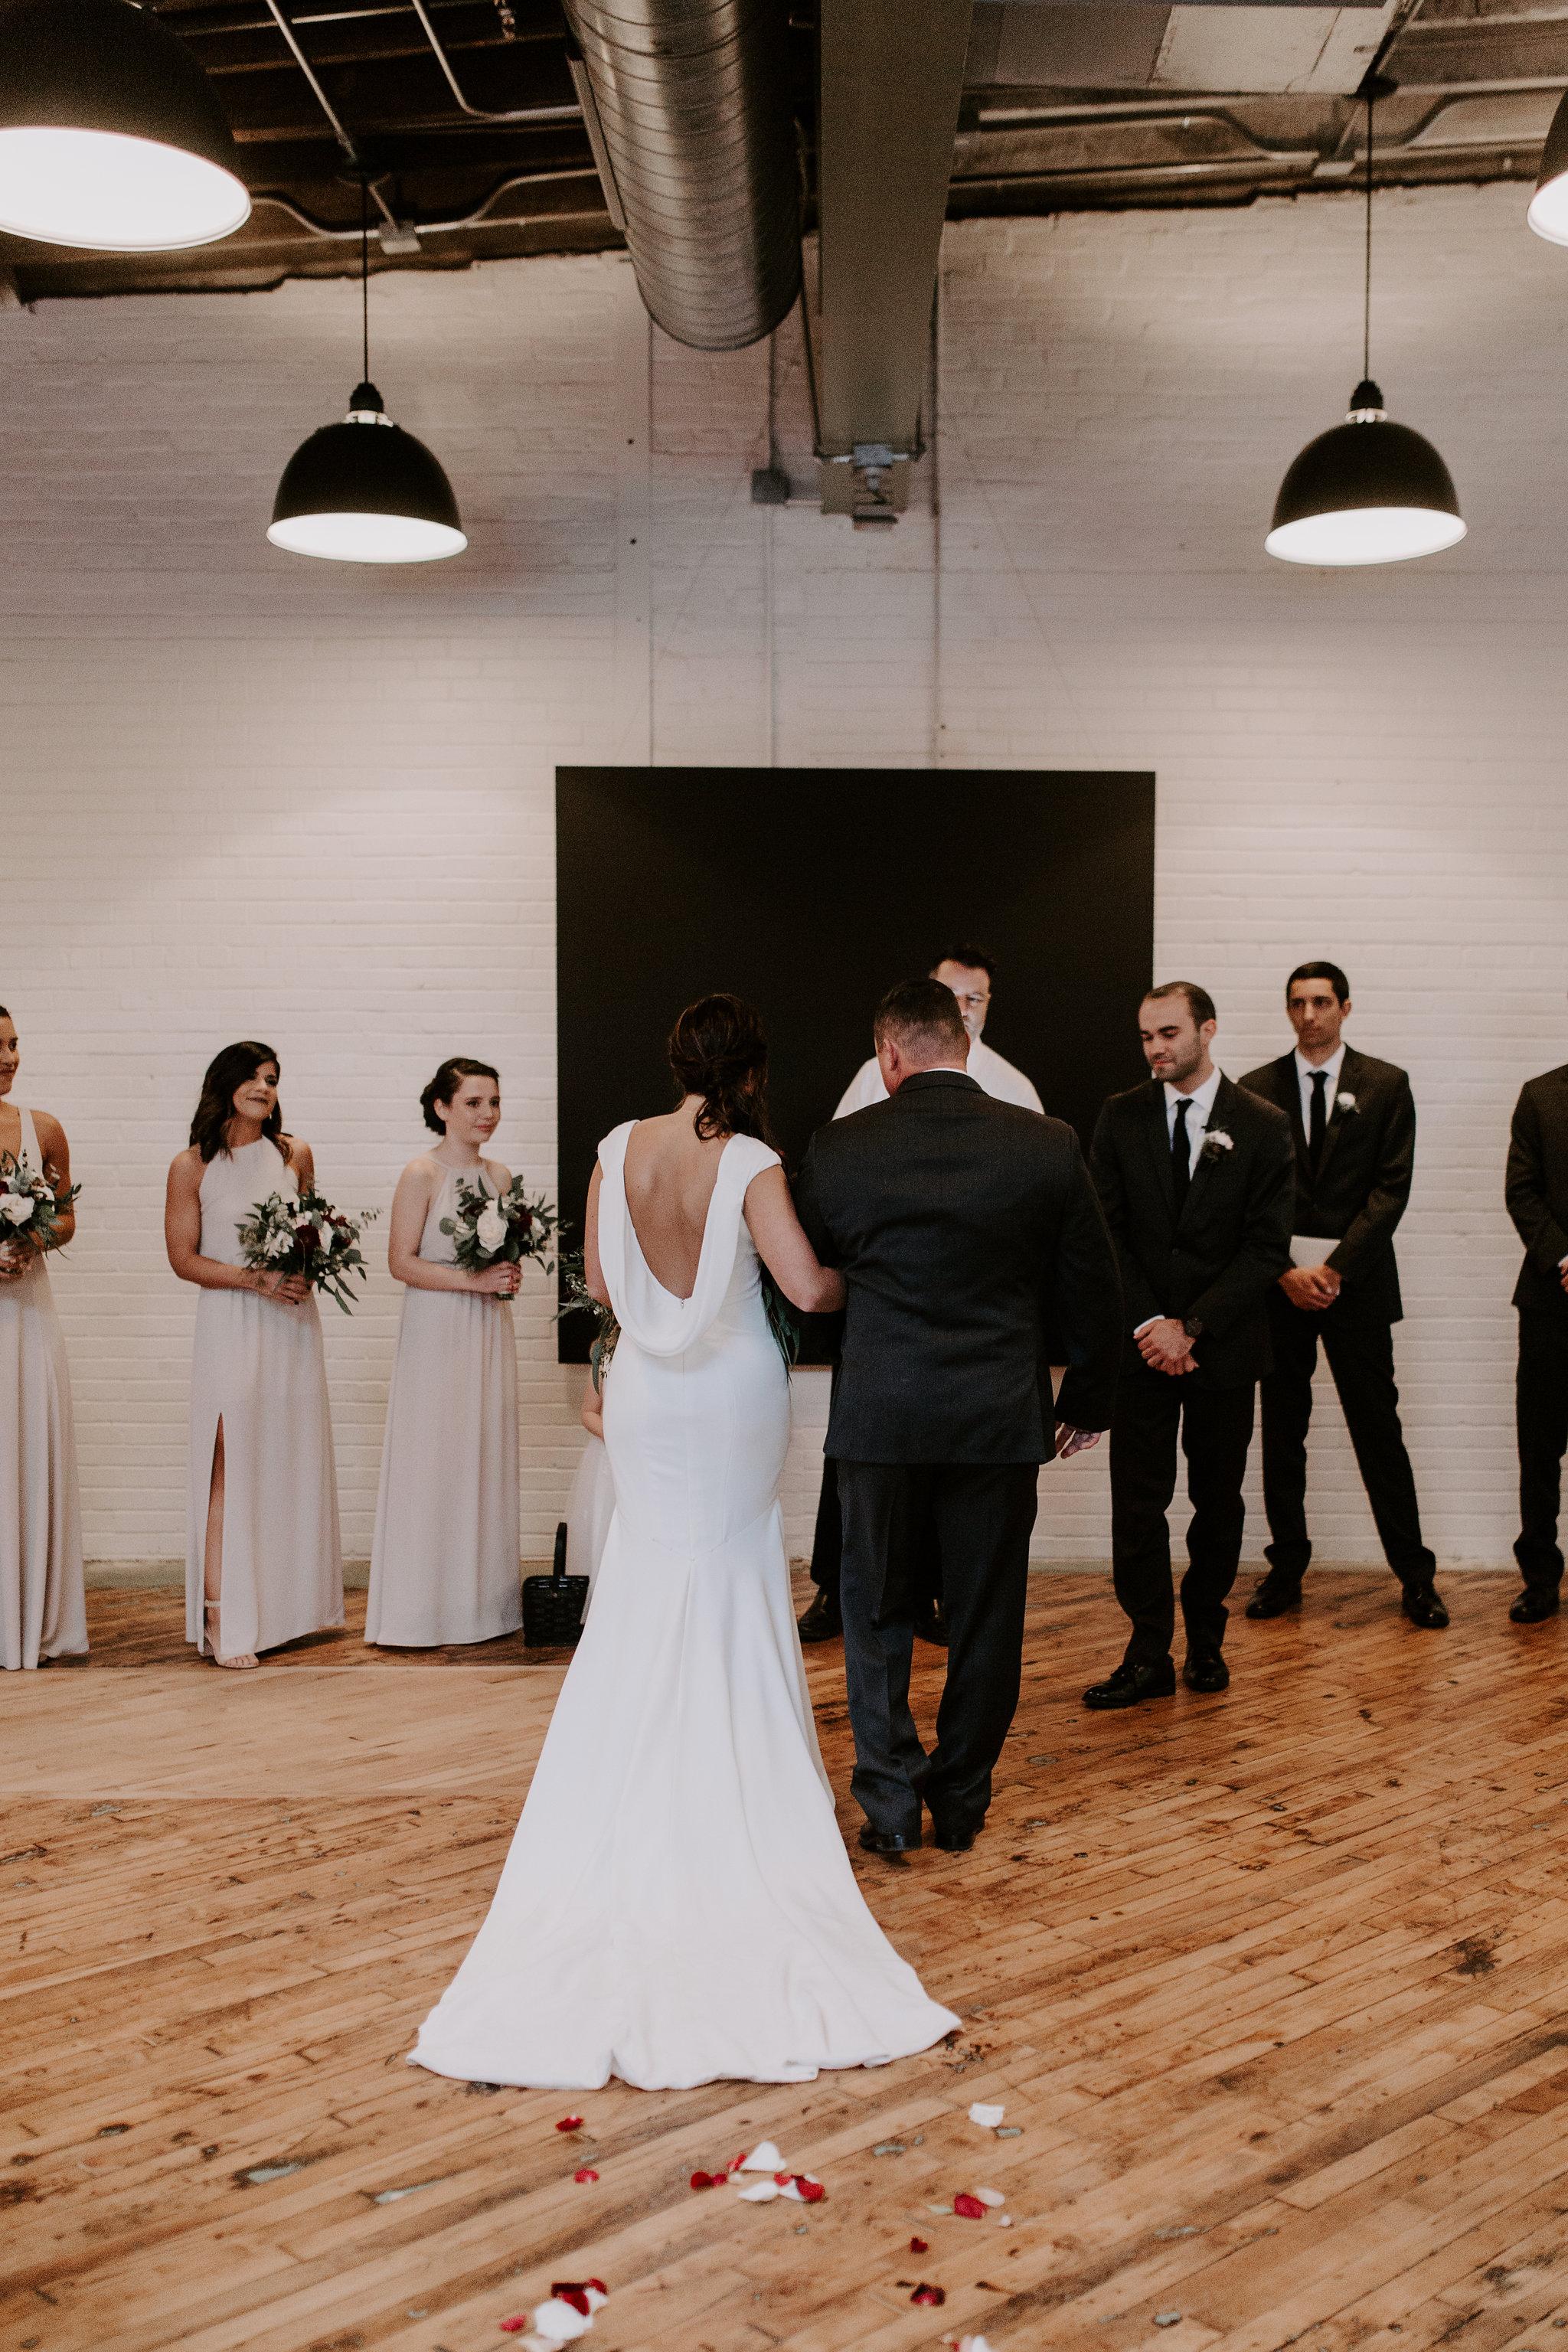 Minimalist Industrial Wedding A Griffin Events Mikayla Herrick DC572.jpg